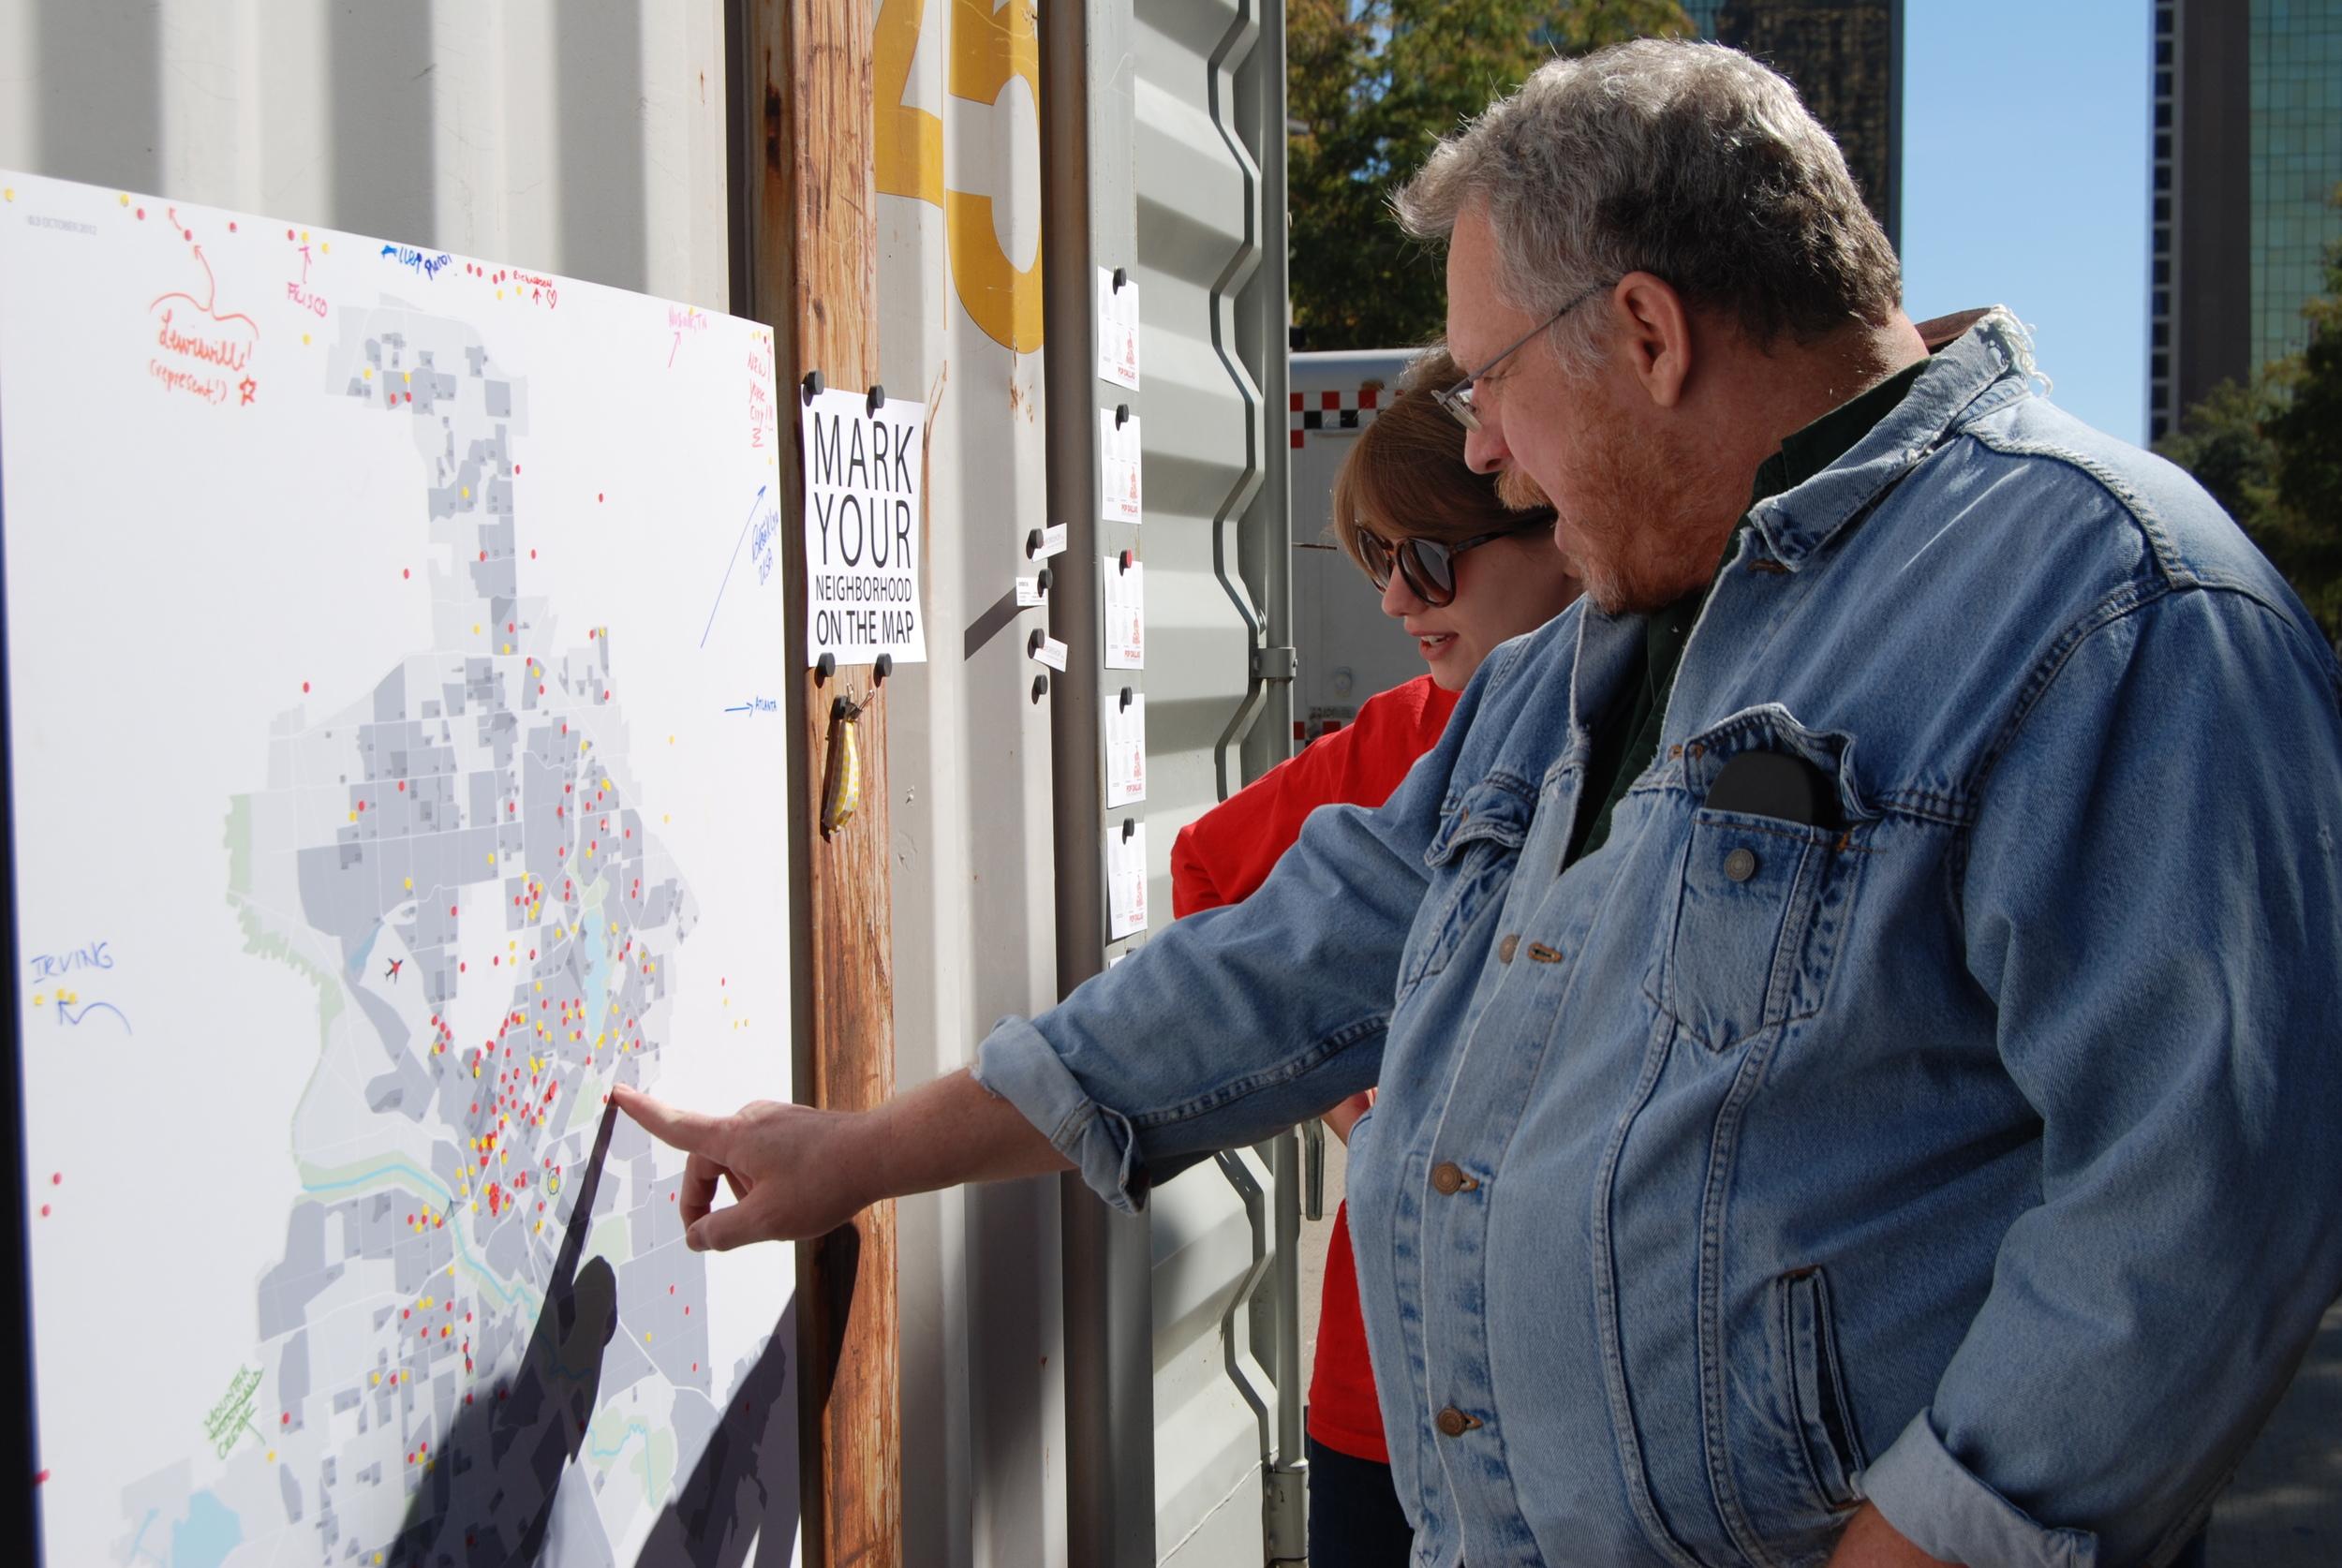 A visitor explains Buckner Terrace's historic boundaries on the City Map